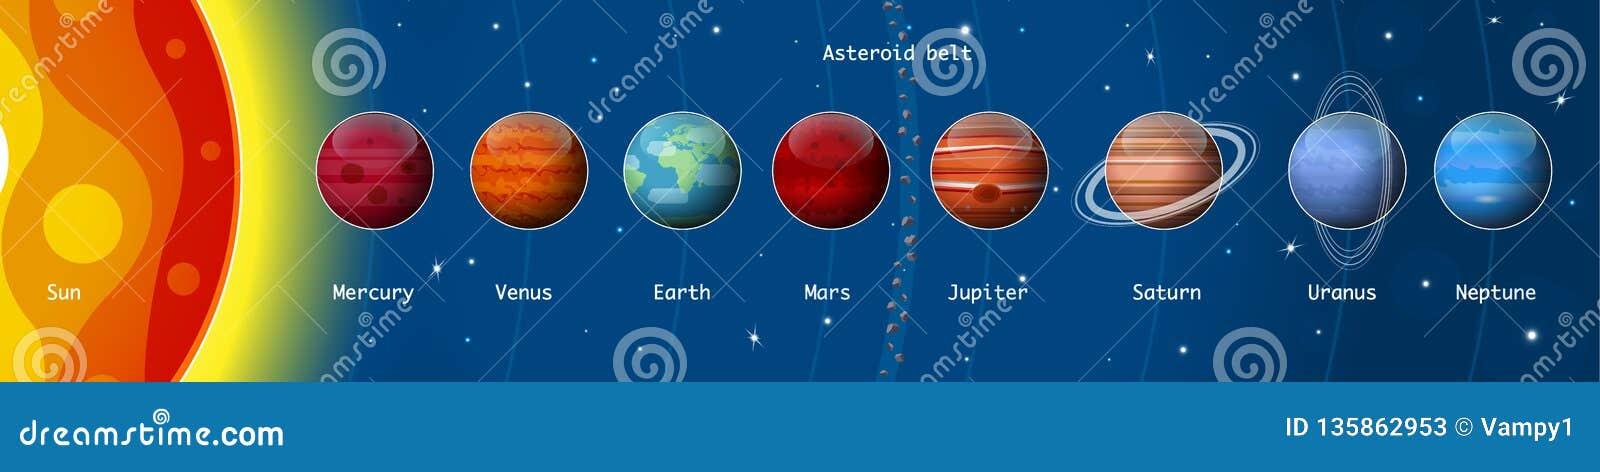 Planeten van het zonnestelsel, zon, Mercury, Venus, Aarde, Maan, Mars, Jupiter, Saturn, Uranus, Neptun